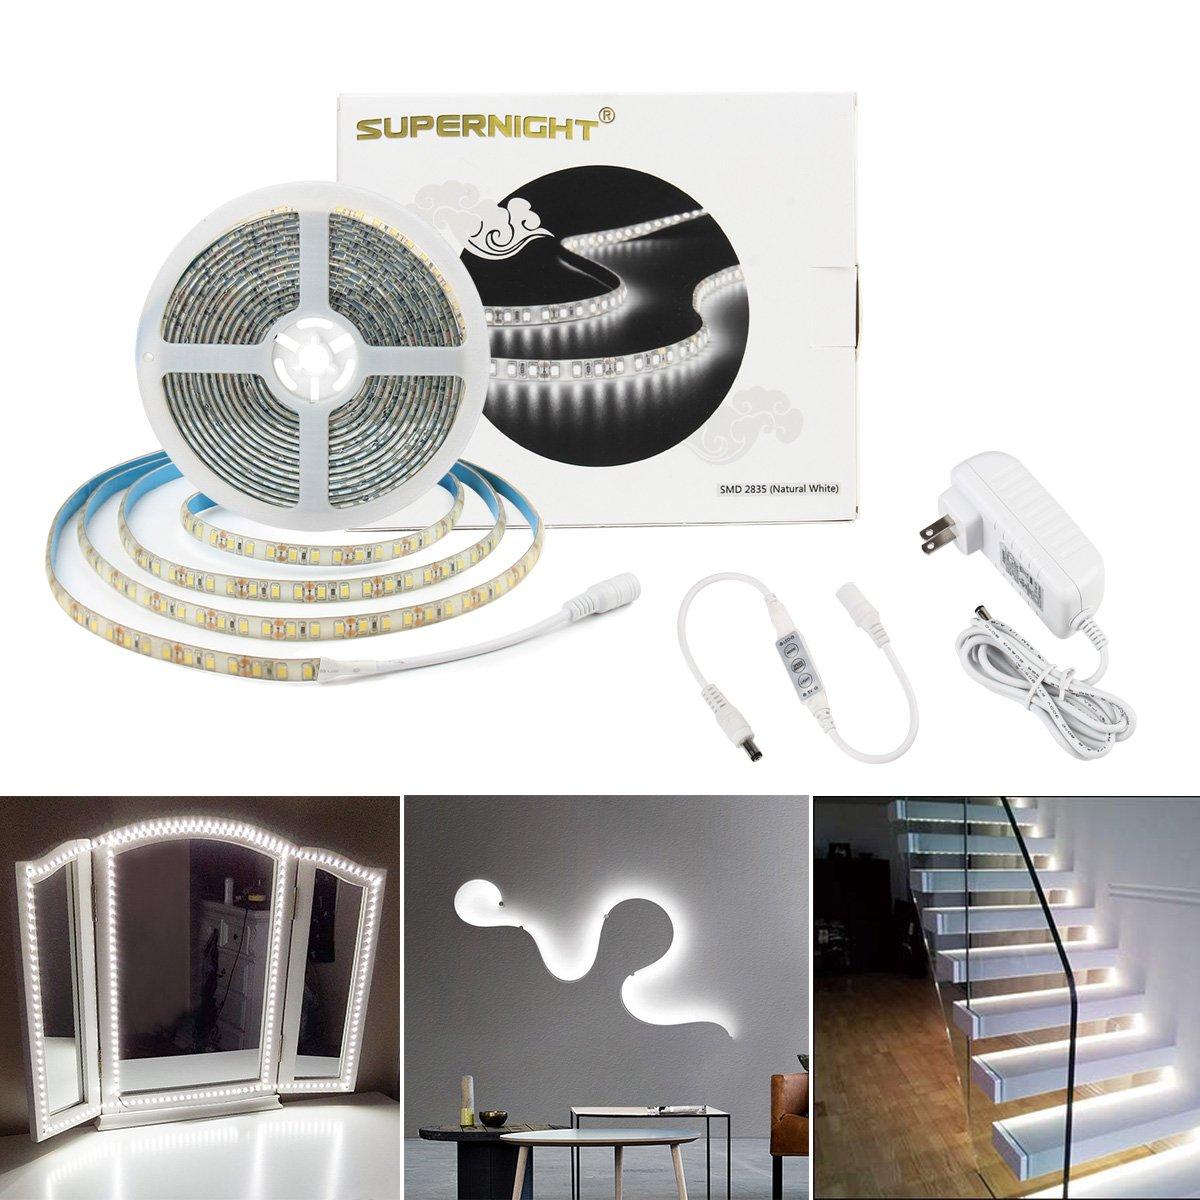 SUPERNIGHT Daylight White LED Light Strip 6500K, Brightness Adjustable 16.4ft 600 LEDs SMD 2835 Strip Light with Dimmer, UL Listed 12V Power Supply for Cabinet, Vanity Mirror, DIY Decoration